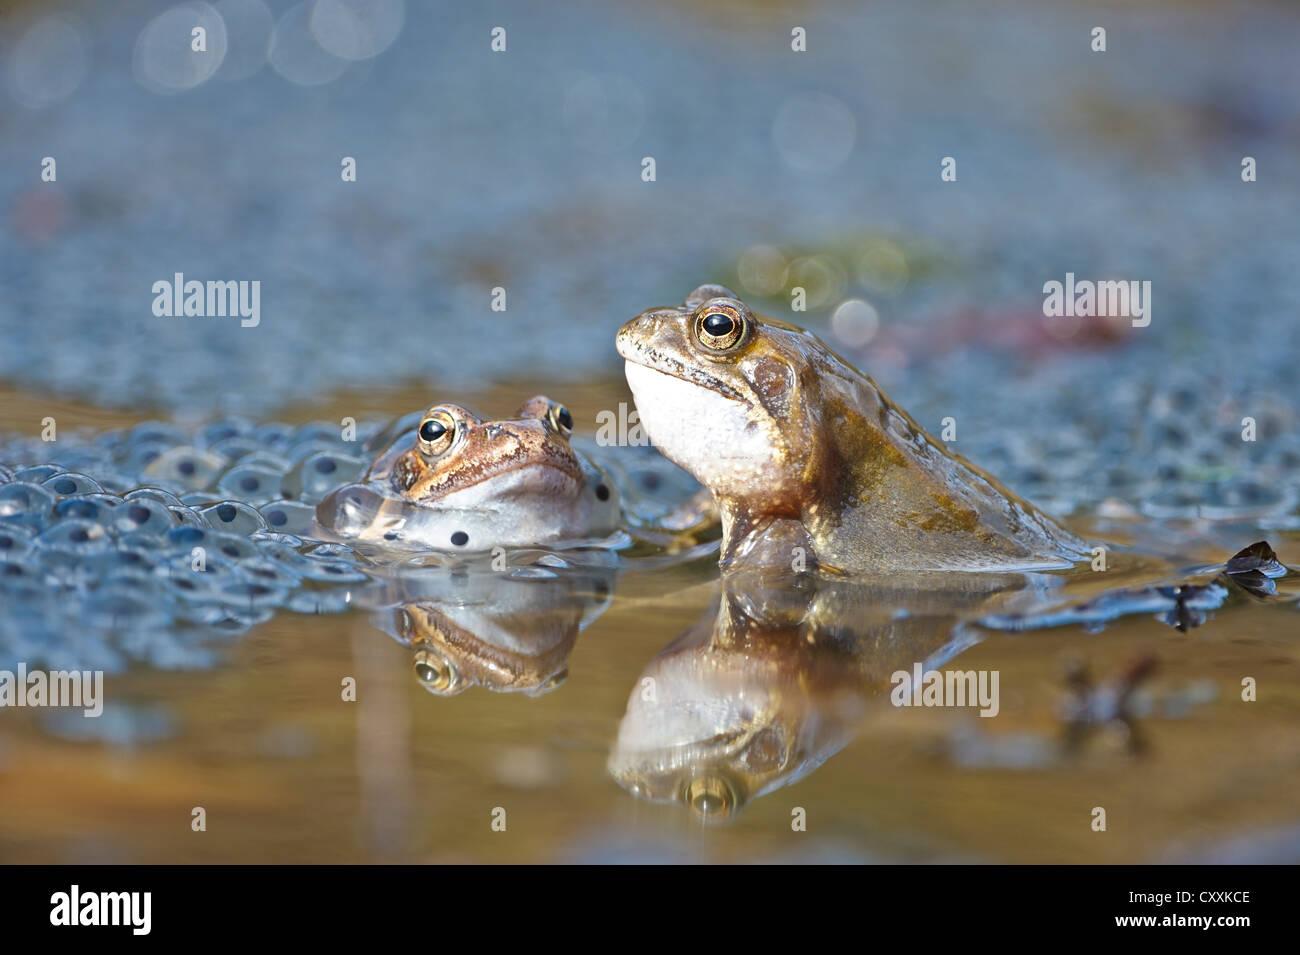 Common frogs (Rana temporaria), spawn, Kalkalpen, Limestone Alps National Park, Upper Austria, Austria, Europe - Stock Image